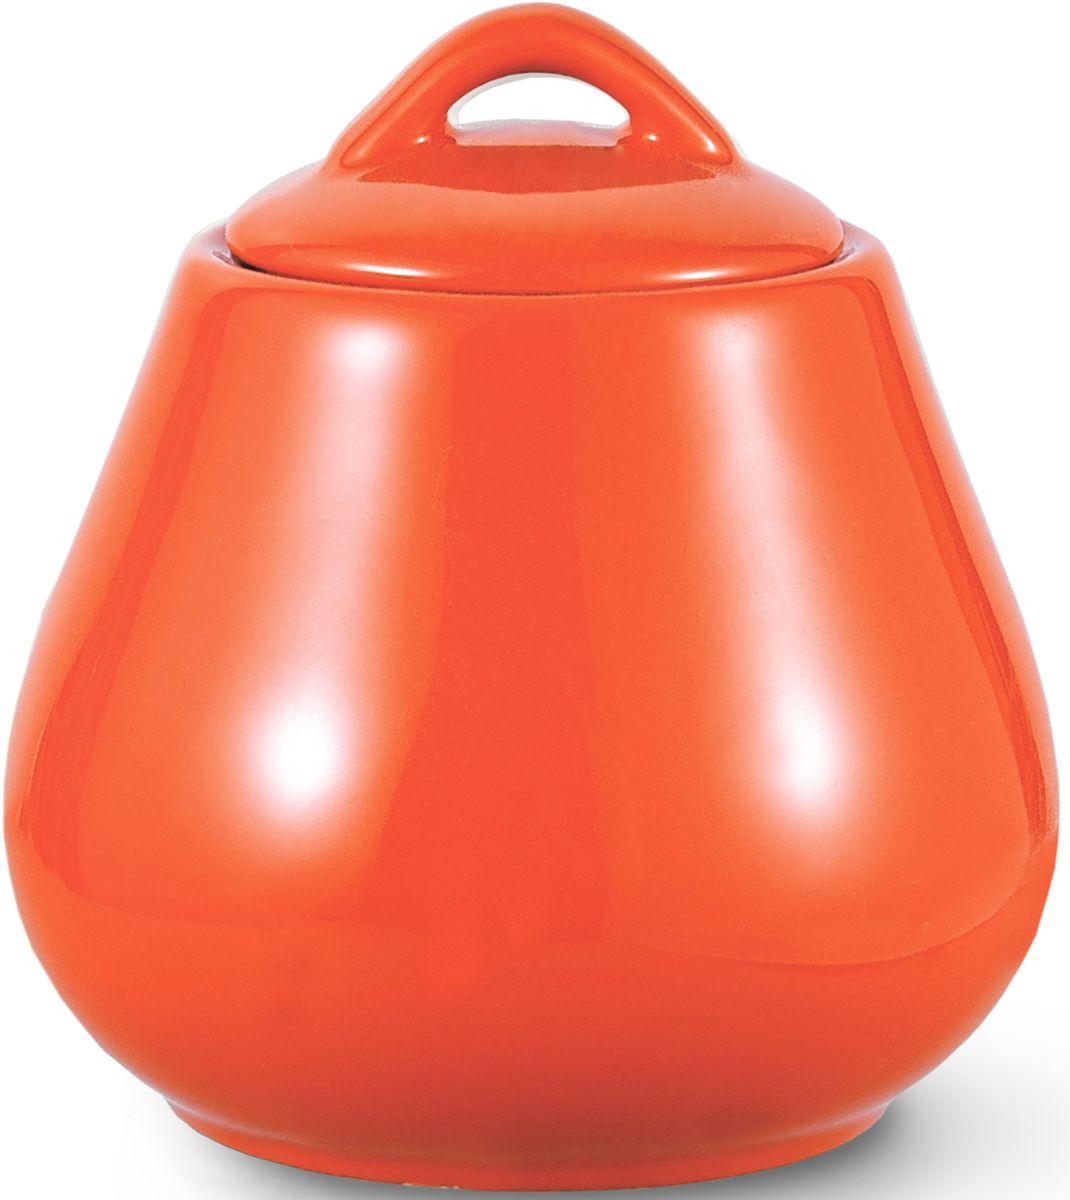 Сахарница Fissman, цвет: оранжевый, 600 мл. 9337SB-9337.600